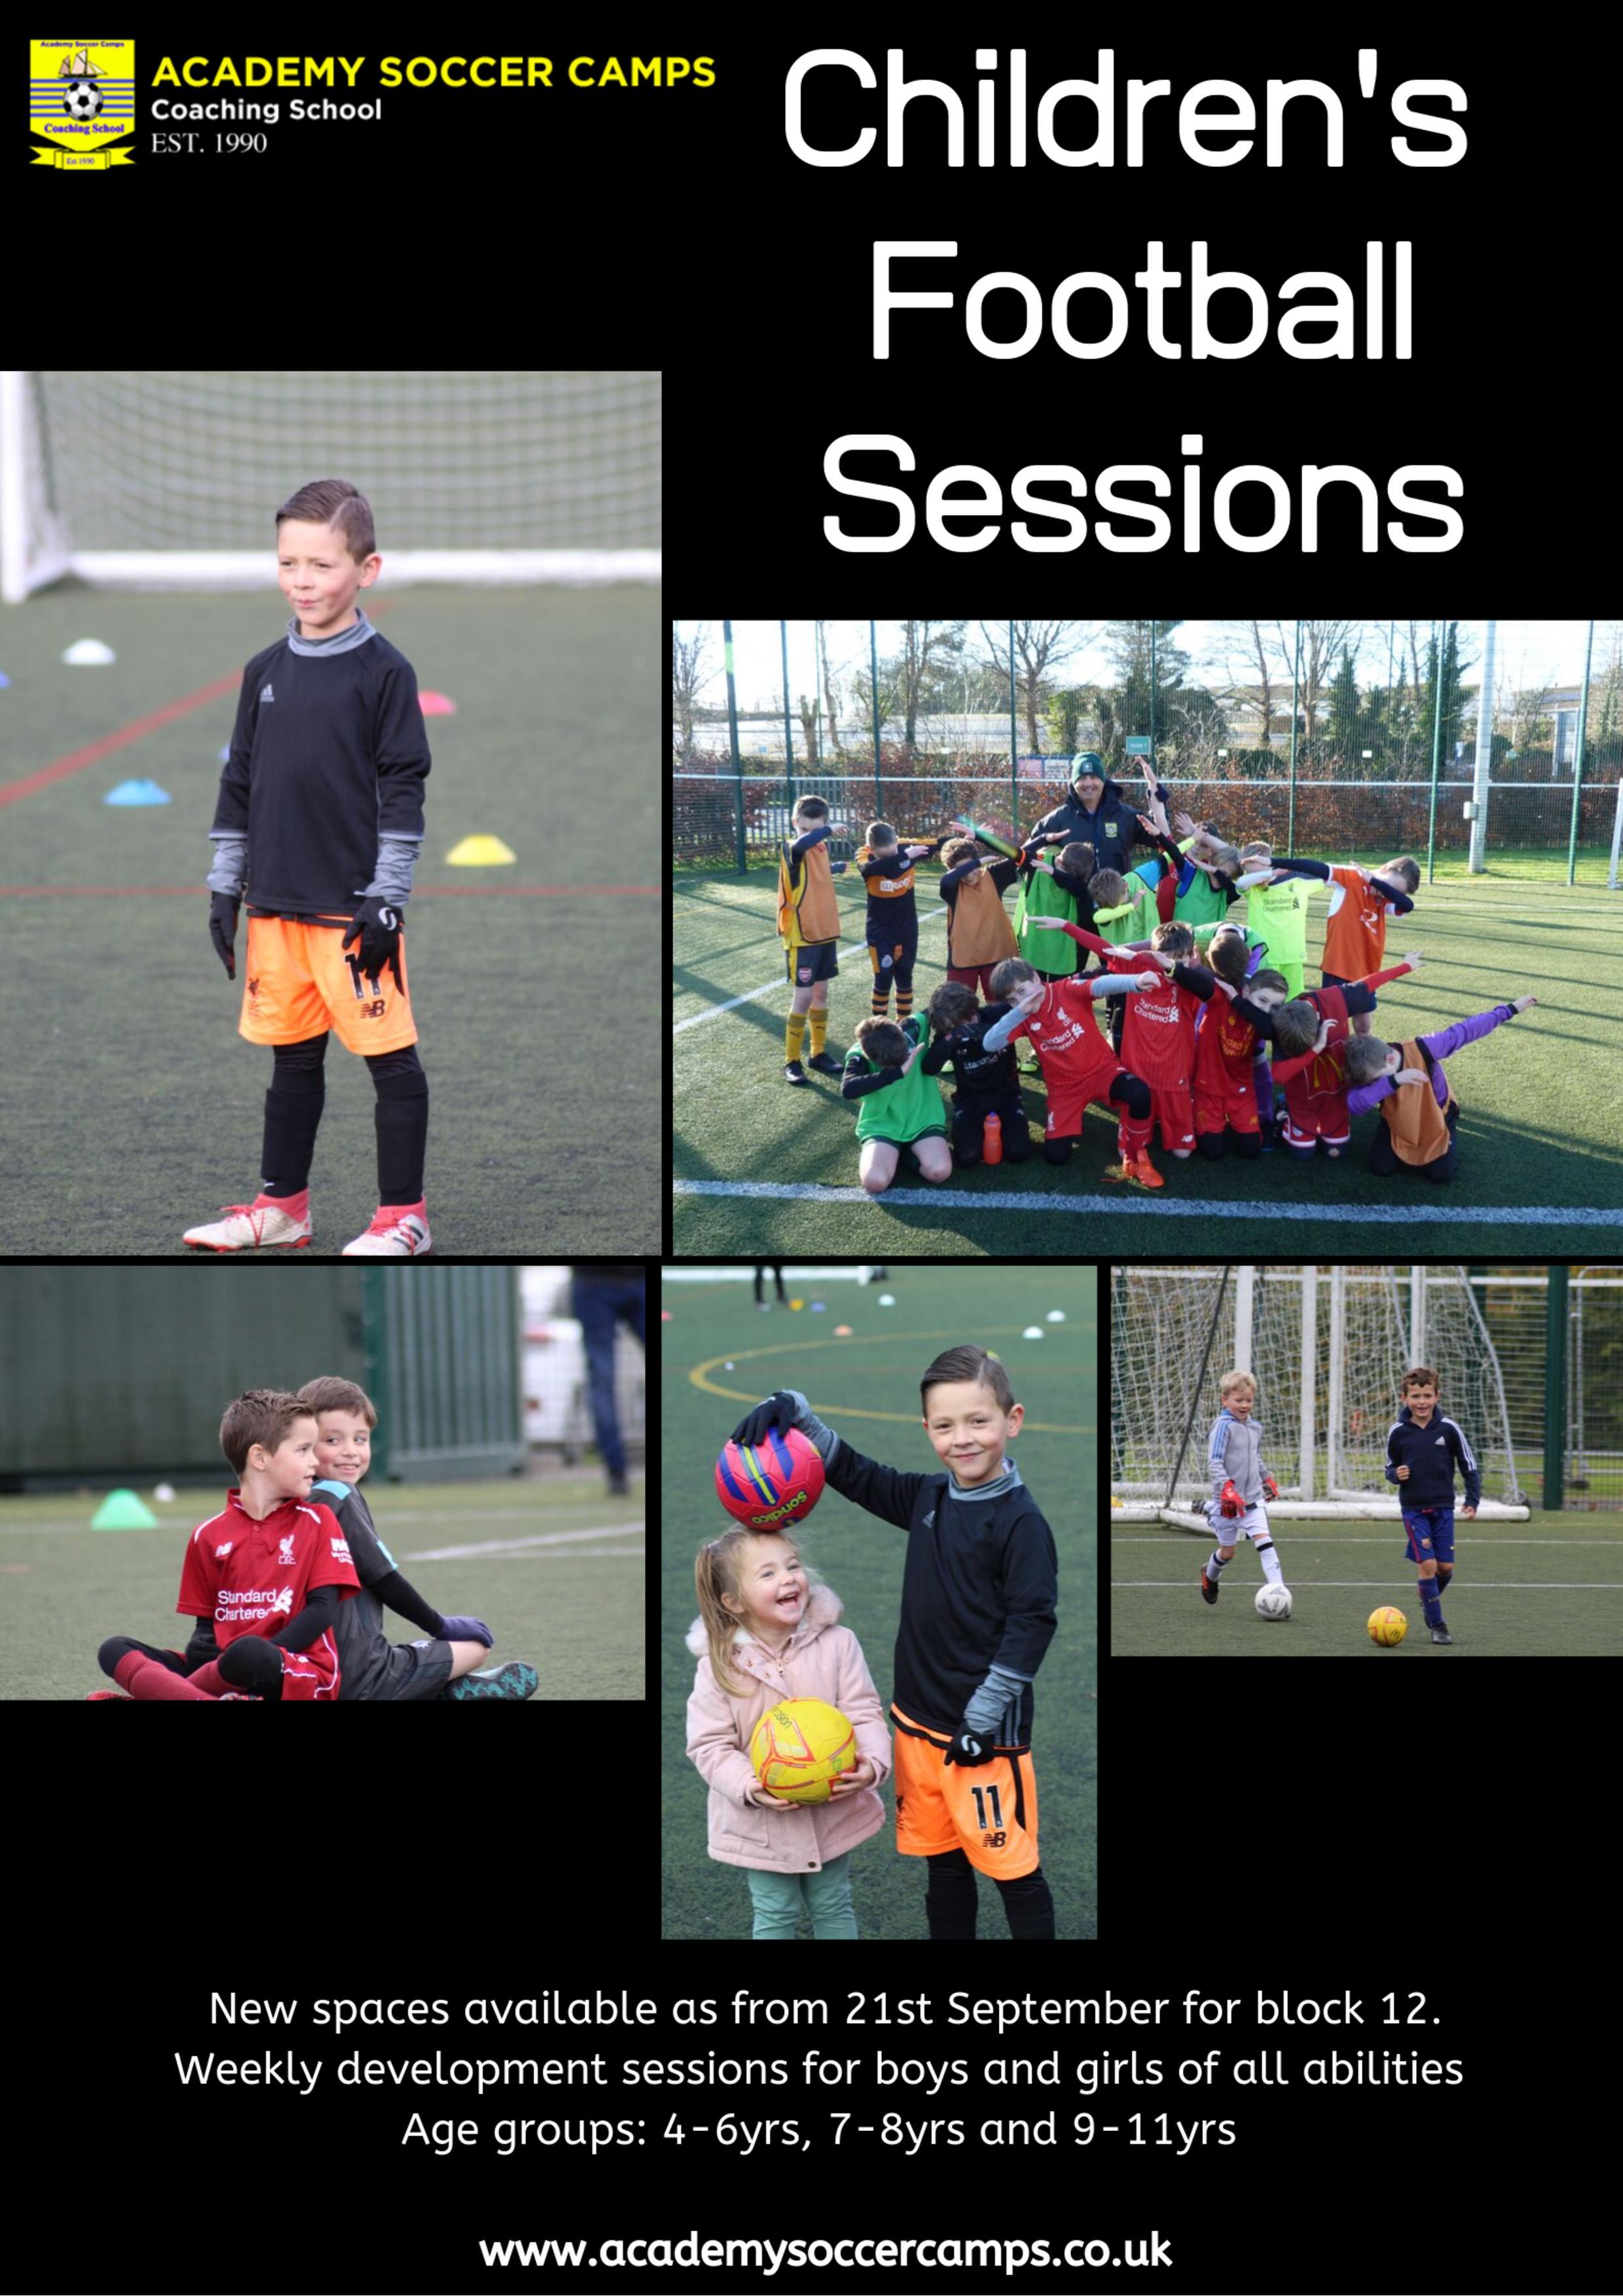 Children's Football Sessions